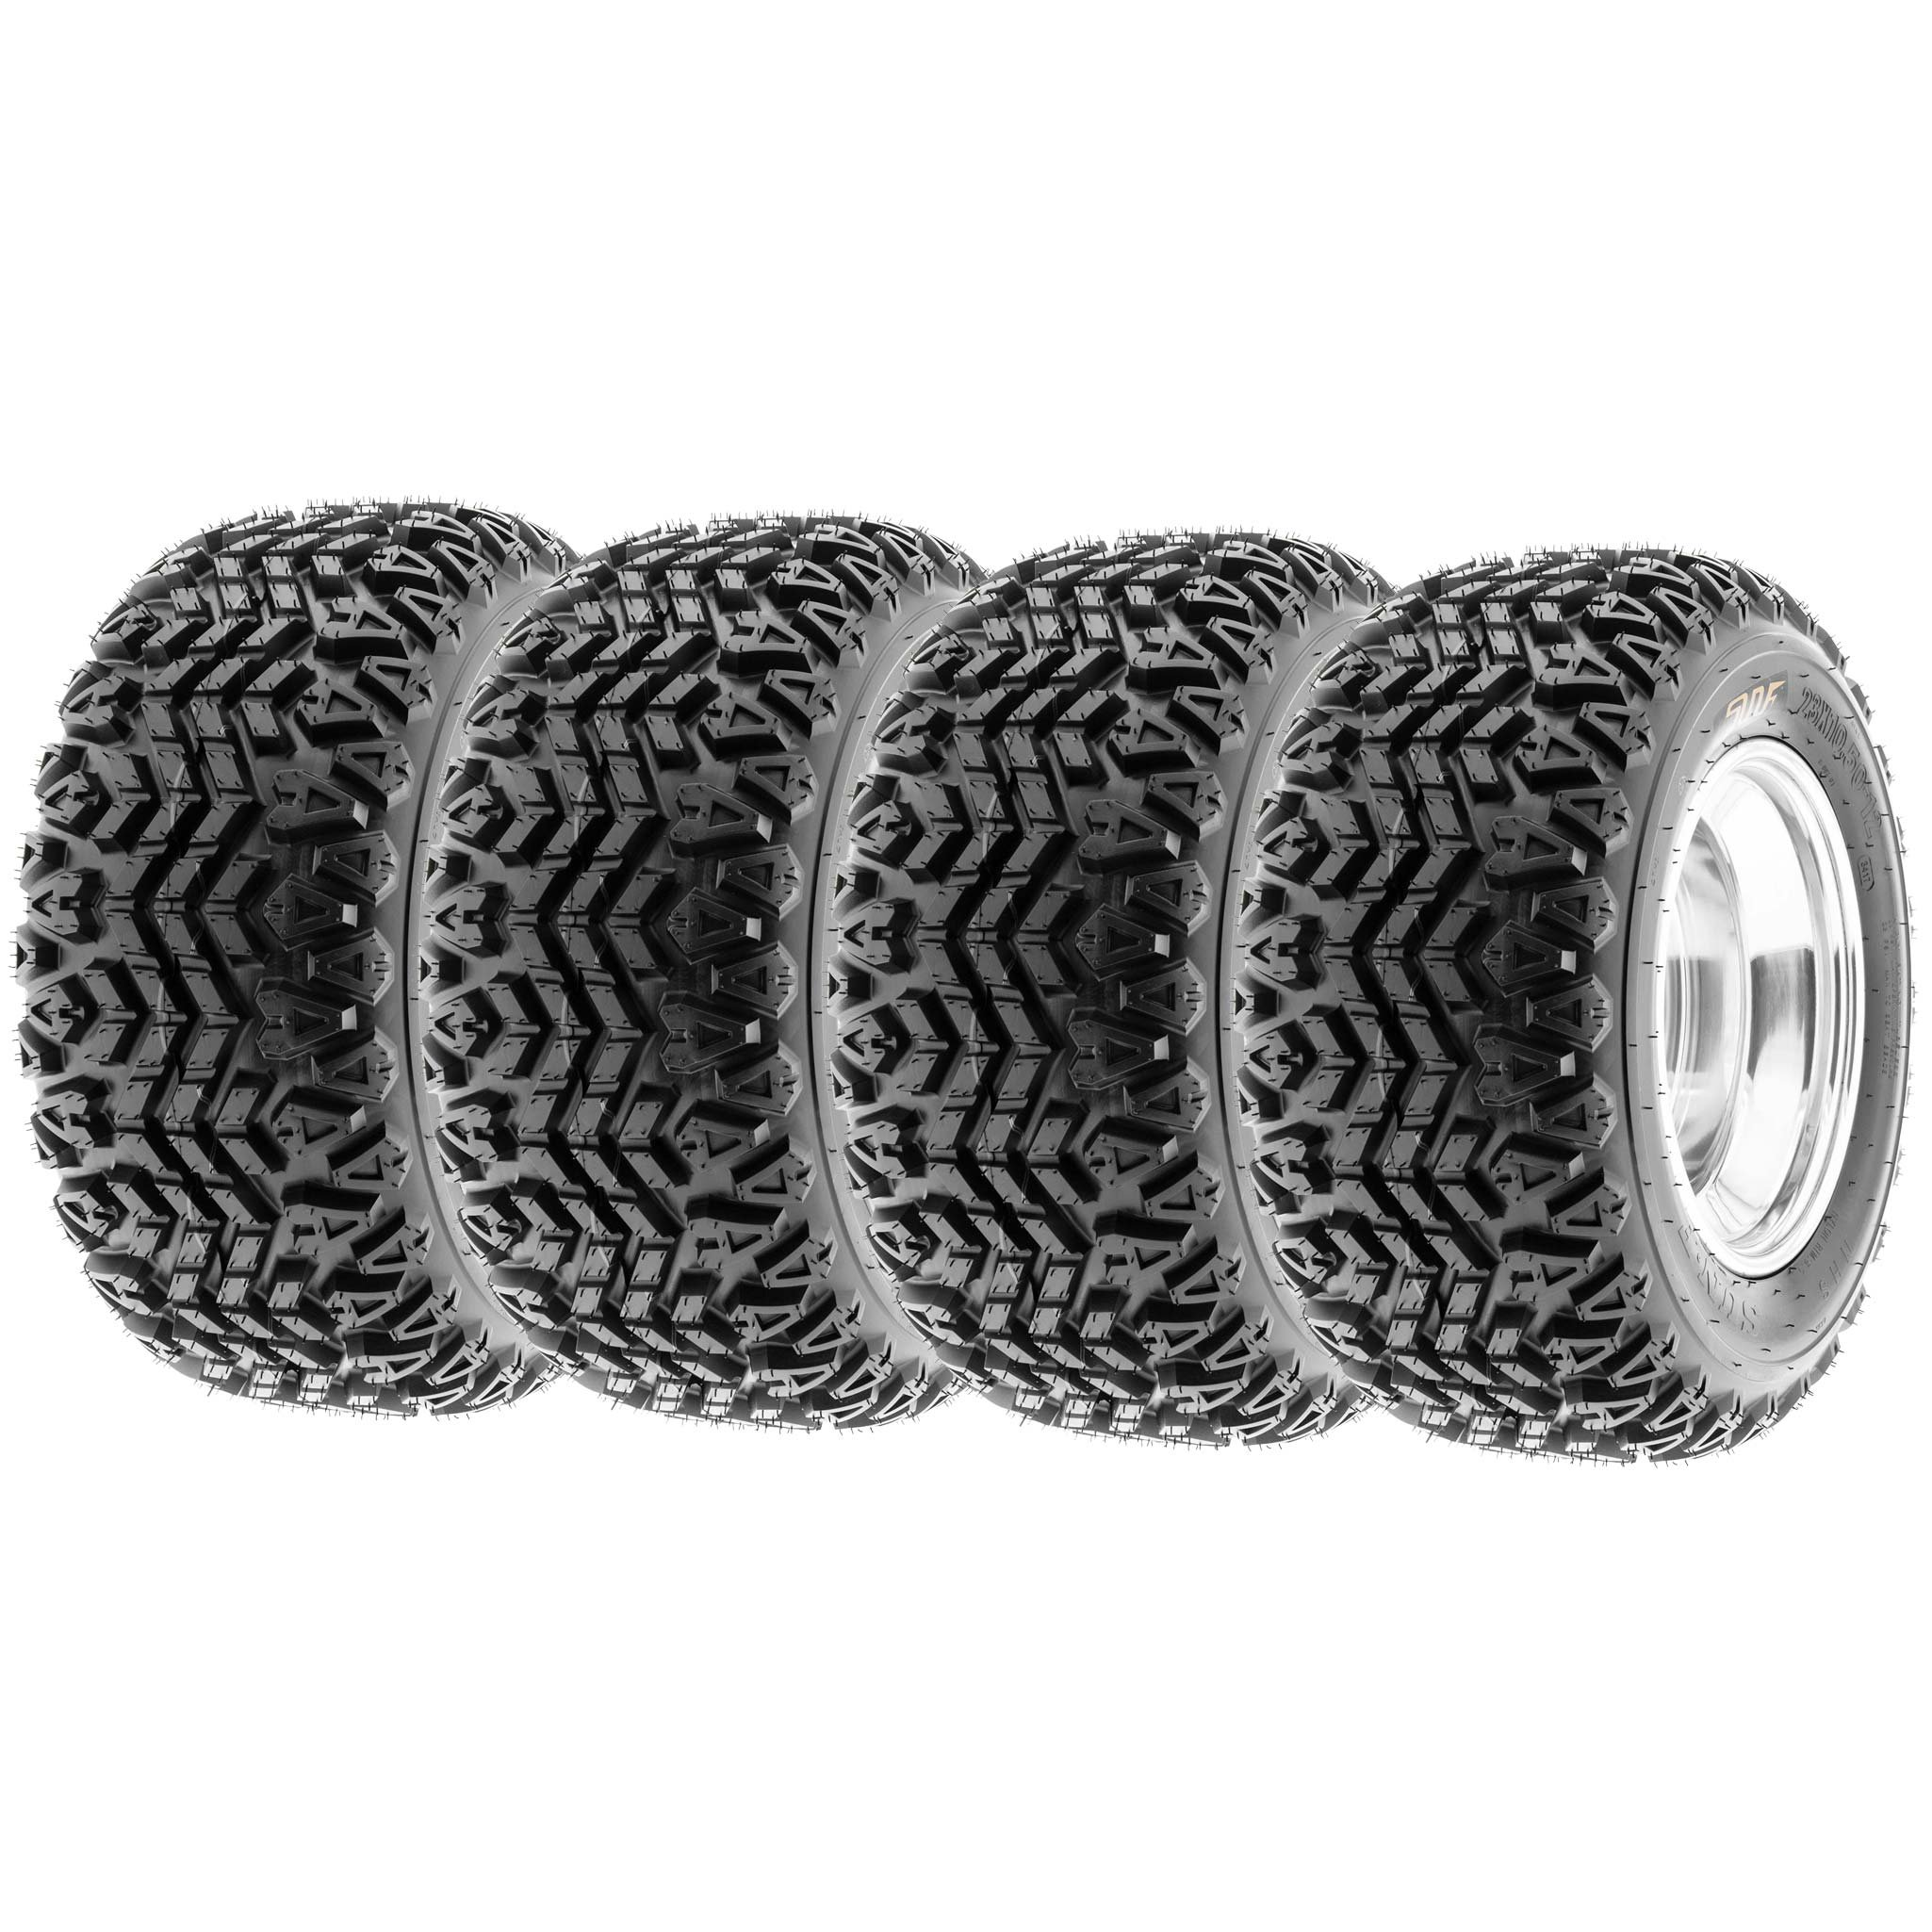 SunF All Trail ATV Tires 23x10.5-12 & 23x10.5x12 4 PR G003 (Full set of 4)